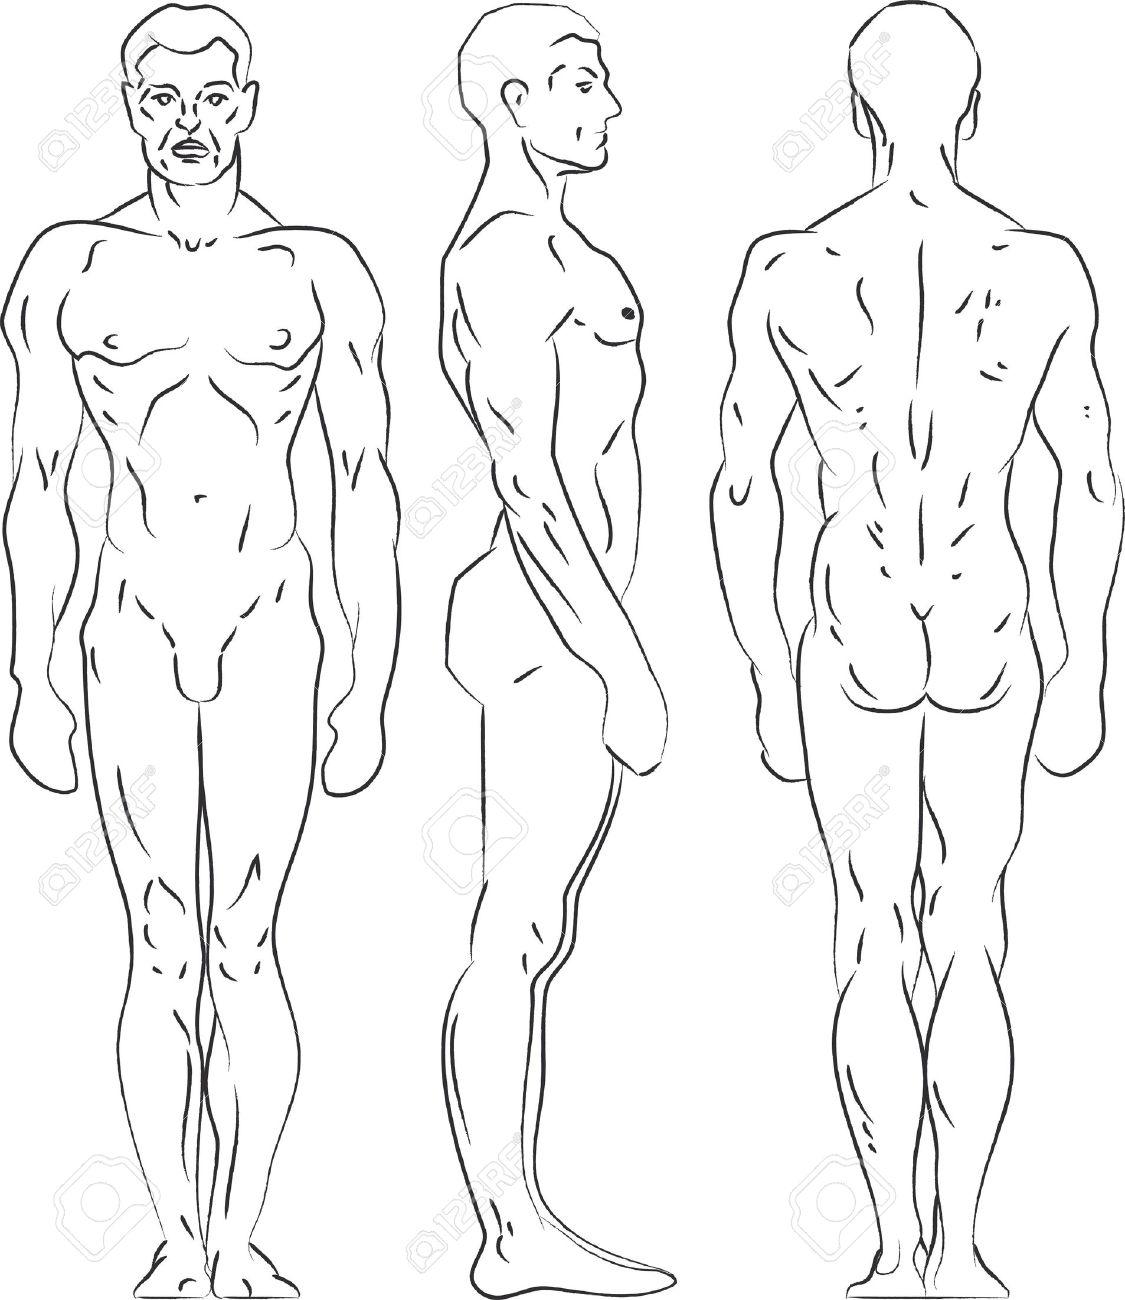 1125x1300 Contour Illustration Male Figure. Profile, Frontal, Rear View